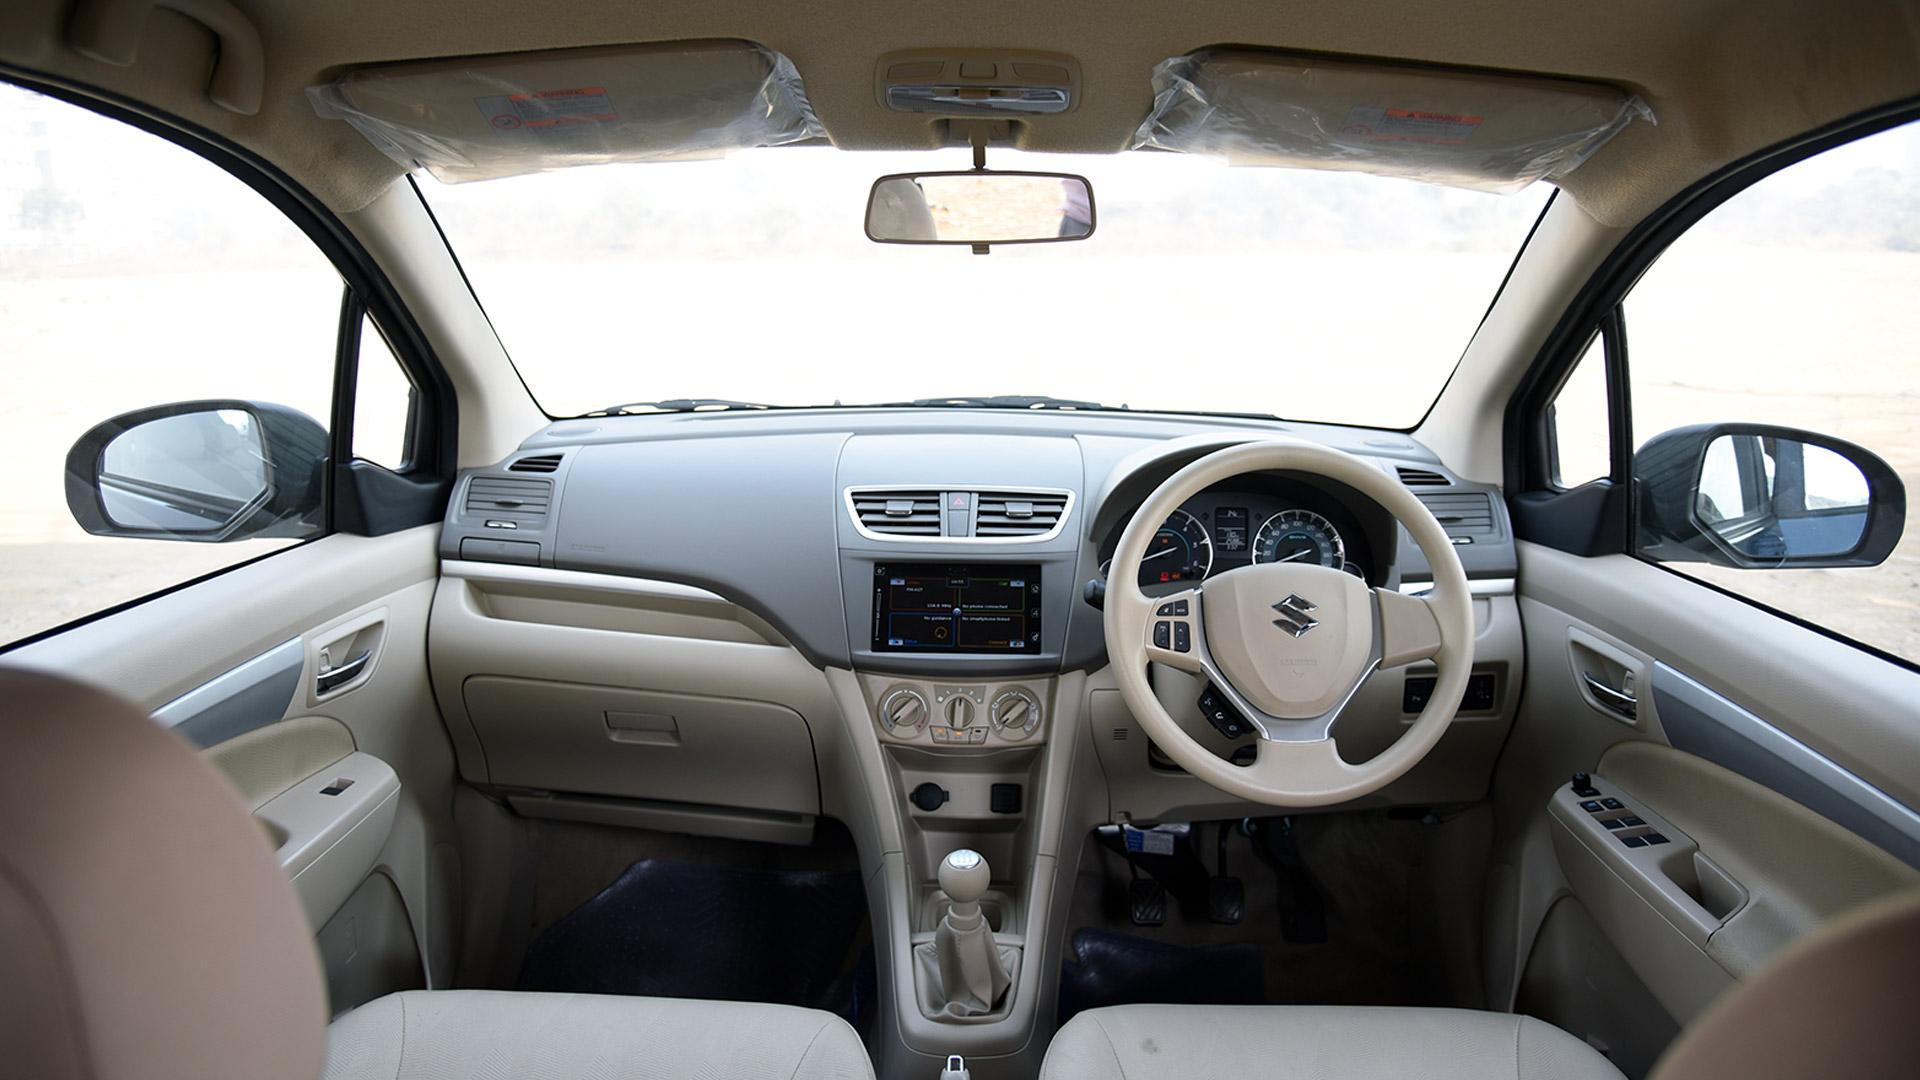 Maruti Suzuki Ertiga 2015 Smart Hybrid Zdi+ Exterior